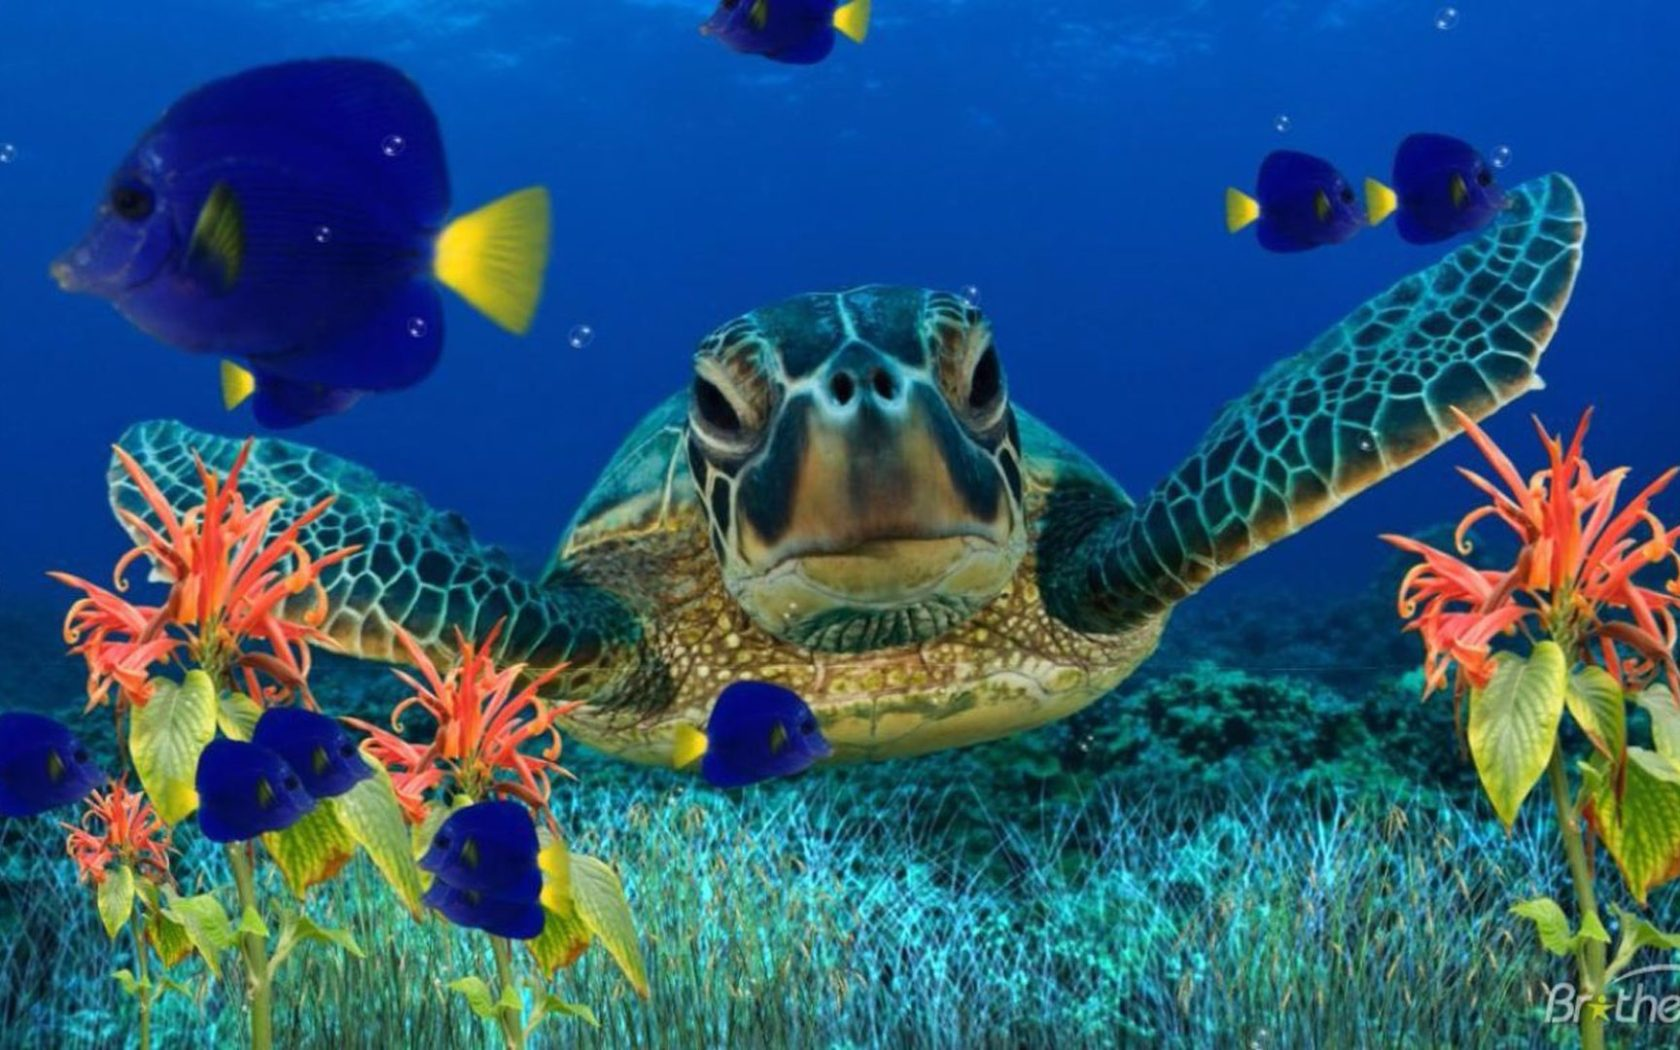 Animated Butterfly Wallpaper Sea Turtle Underwater Flora Fish Art Wallpaper Hd